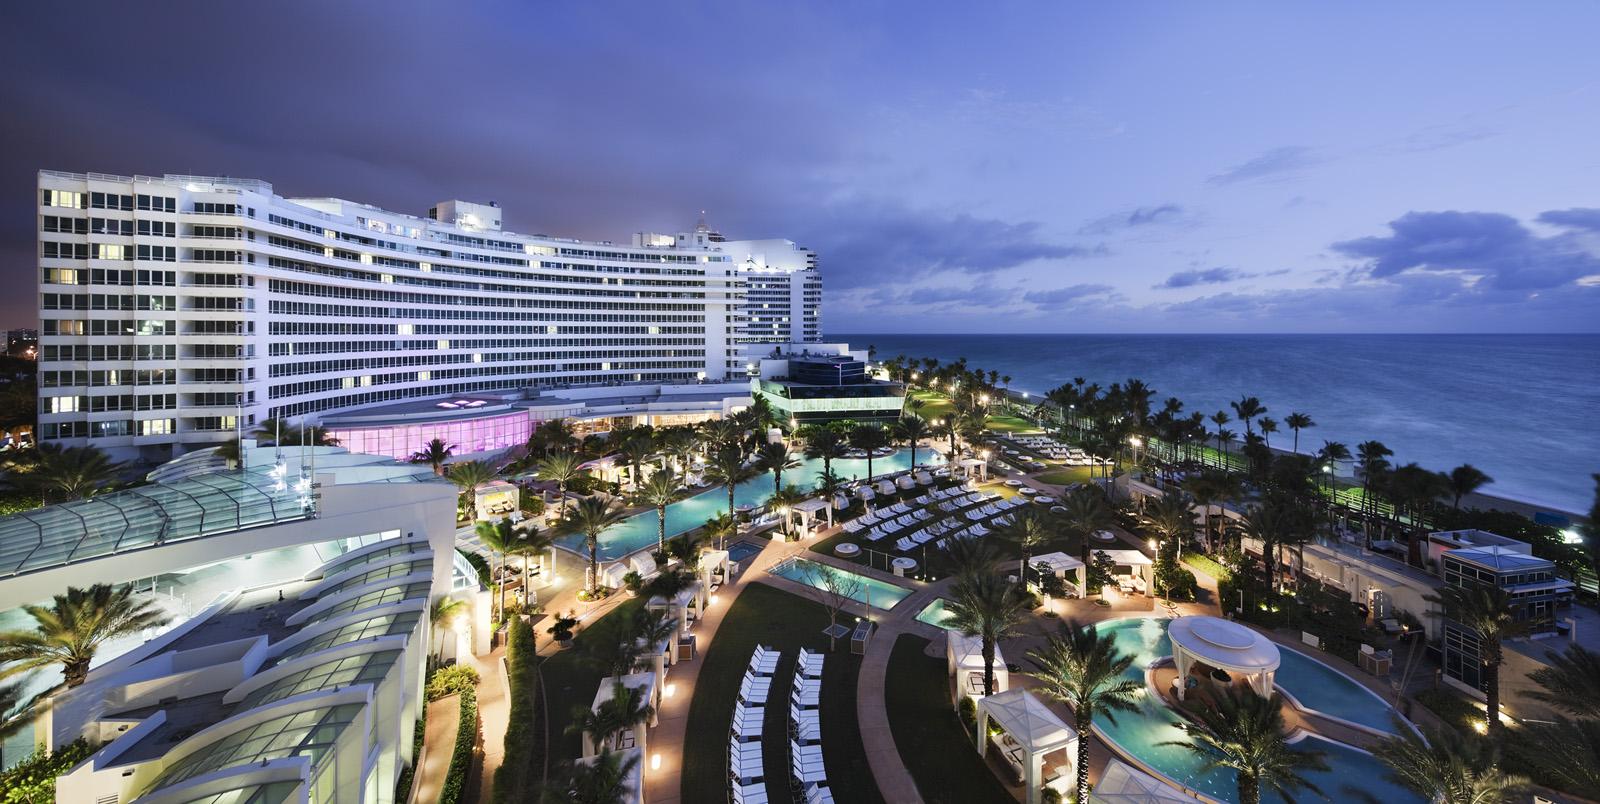 The Fontainebleau a Miami Beach